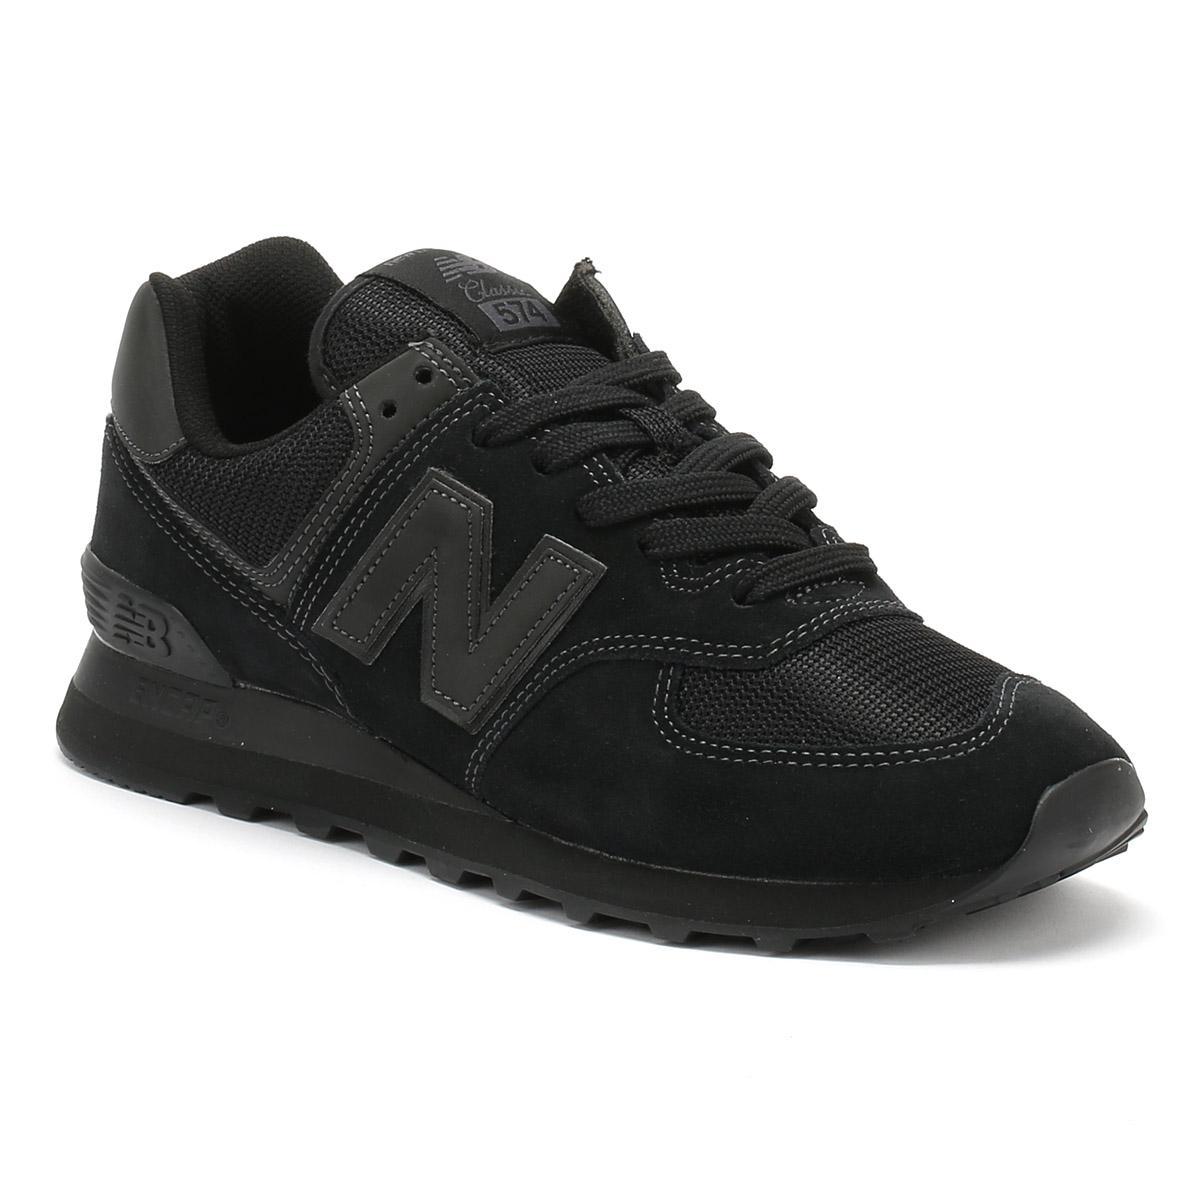 new styles d58f8 f4947 Mens Black 574 Classic Sneakers